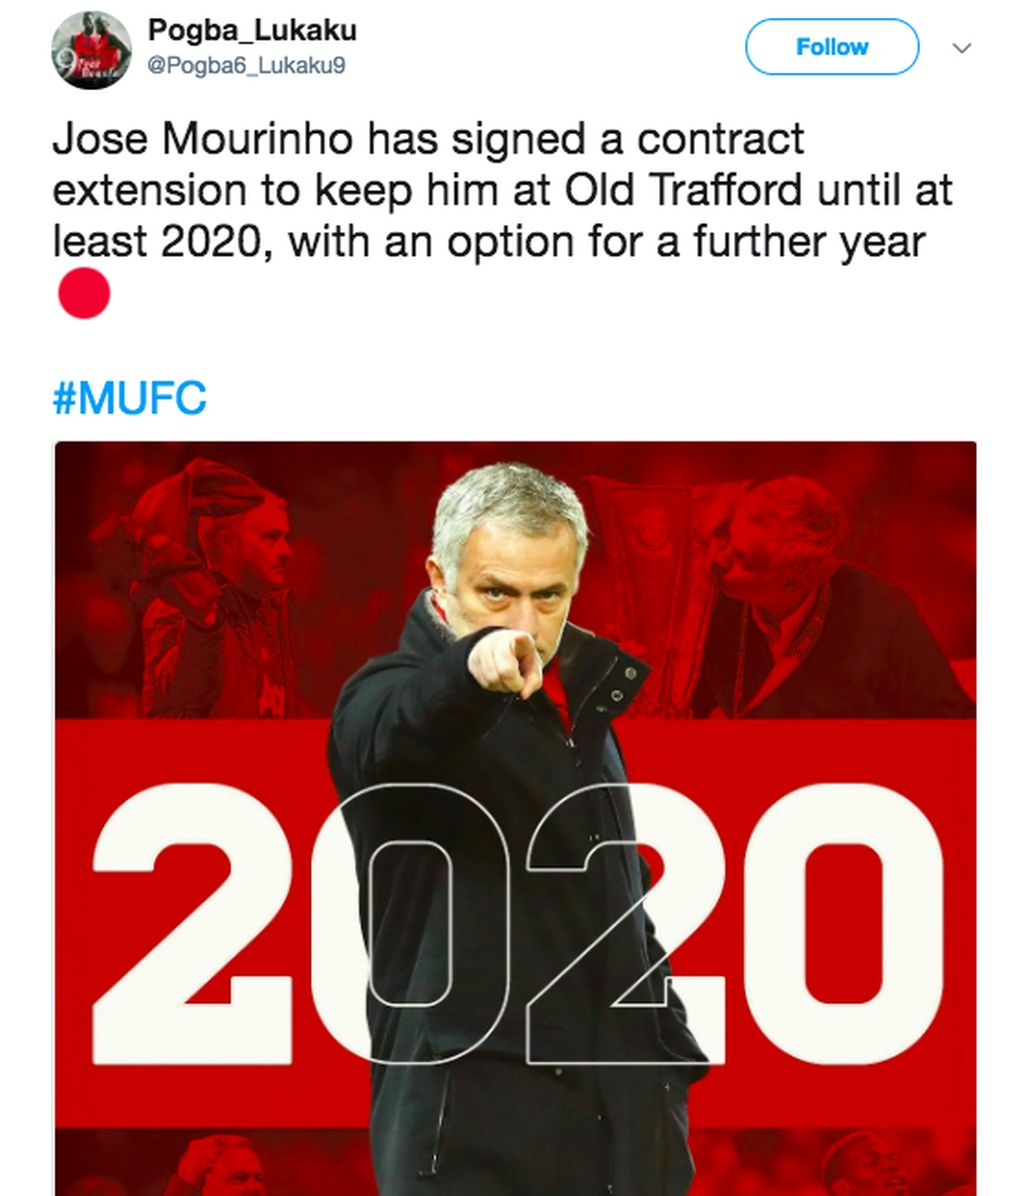 Sebuah akun Twitter mengatasnamakan Pogba Lukaku menggambarkan Mourinho dengan latar belakang 2020. Foto: istimewa